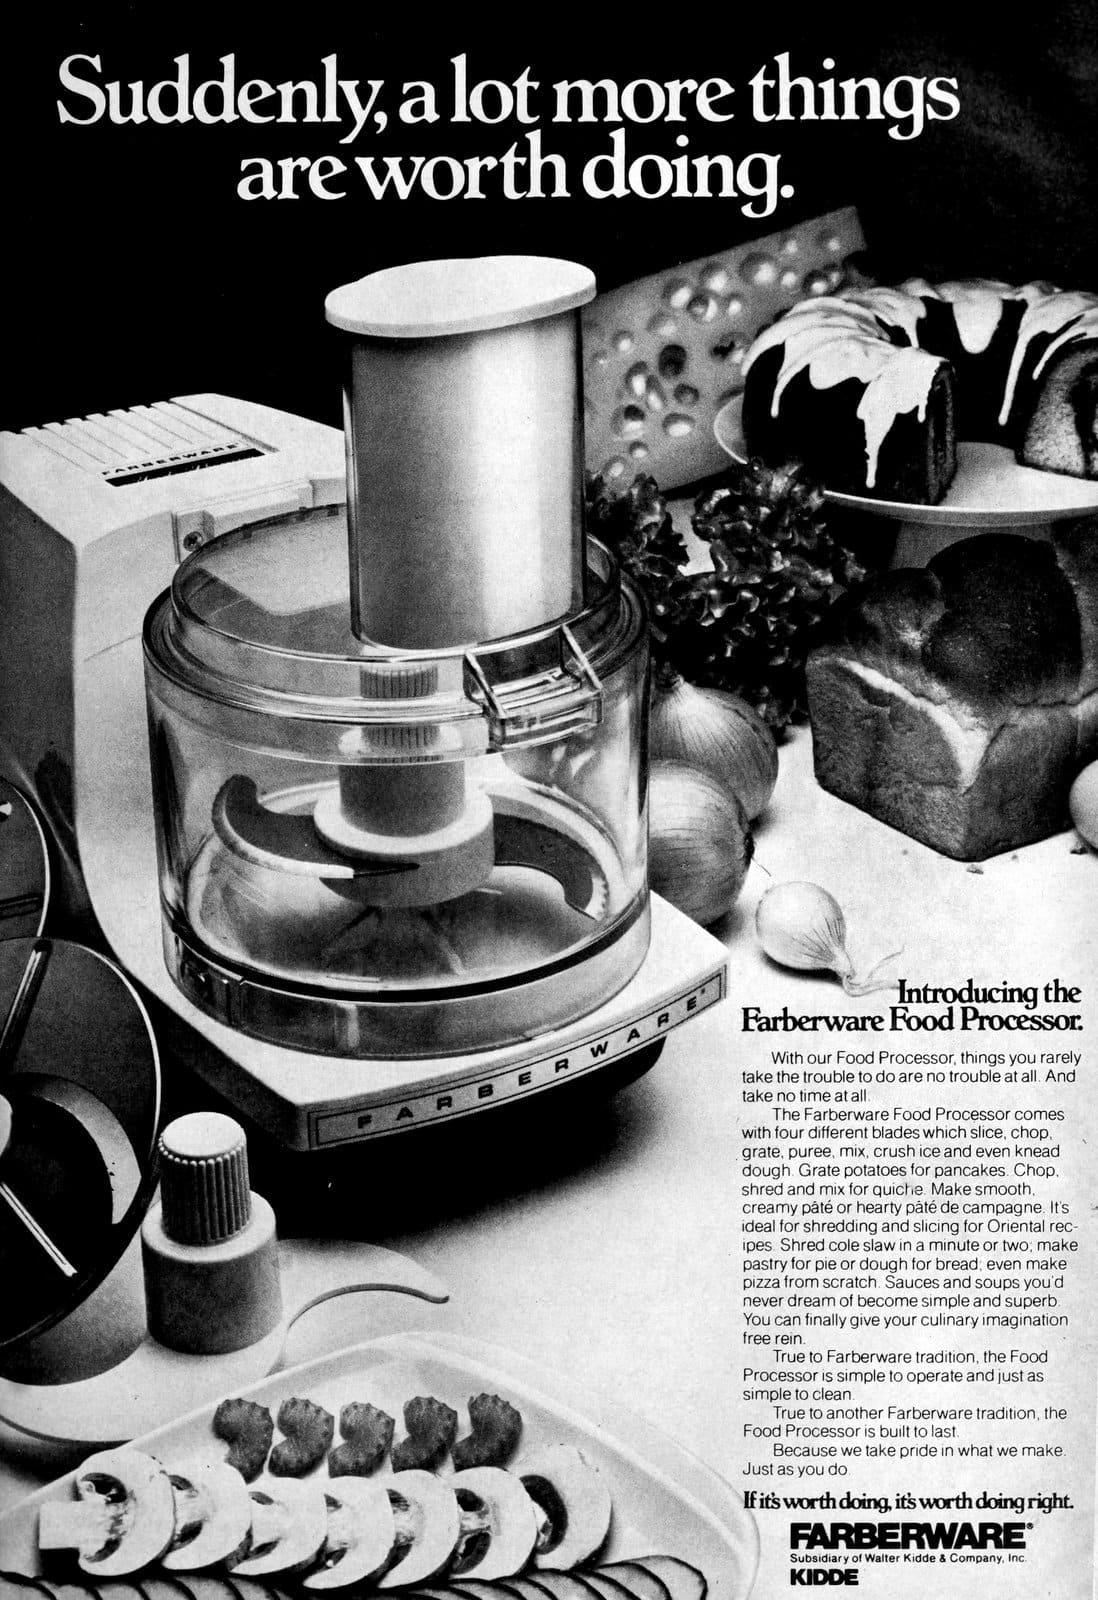 Old-fashioned seventies Farberware food processor (1977)